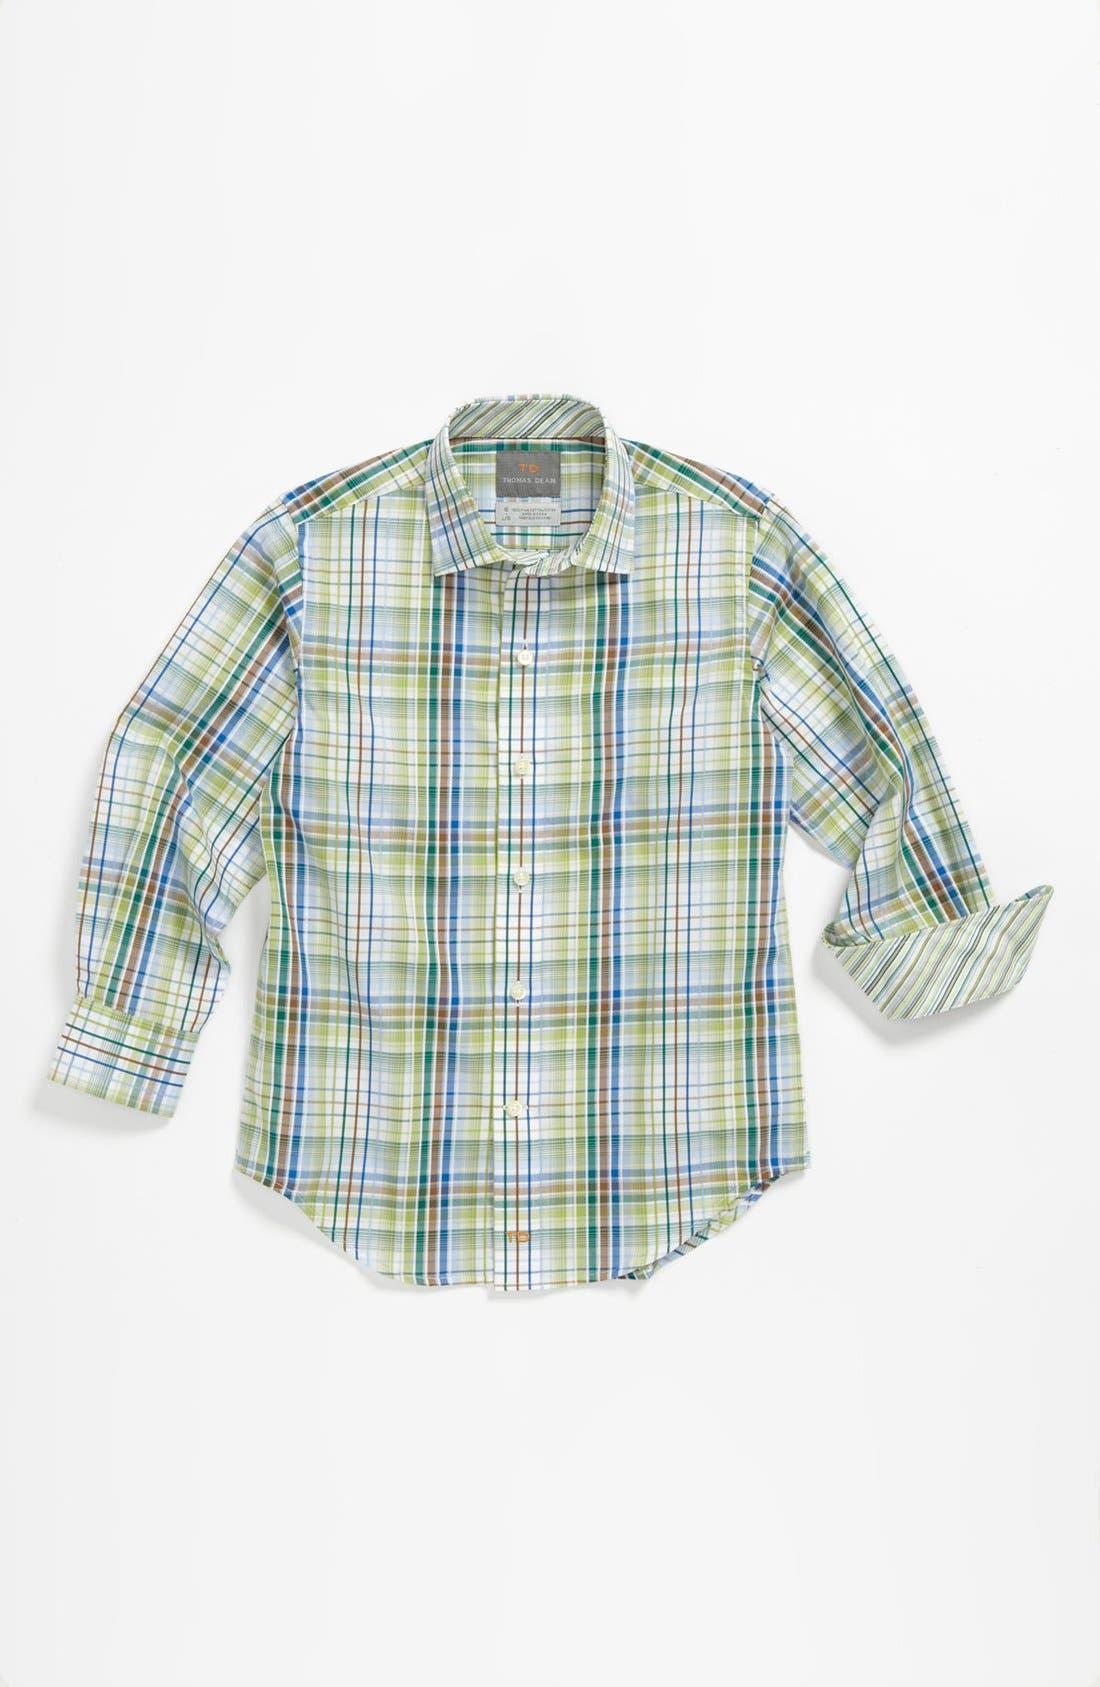 Alternate Image 1 Selected - Thomas Dean Plaid Dress Shirt (Little Boys & Big Boys)